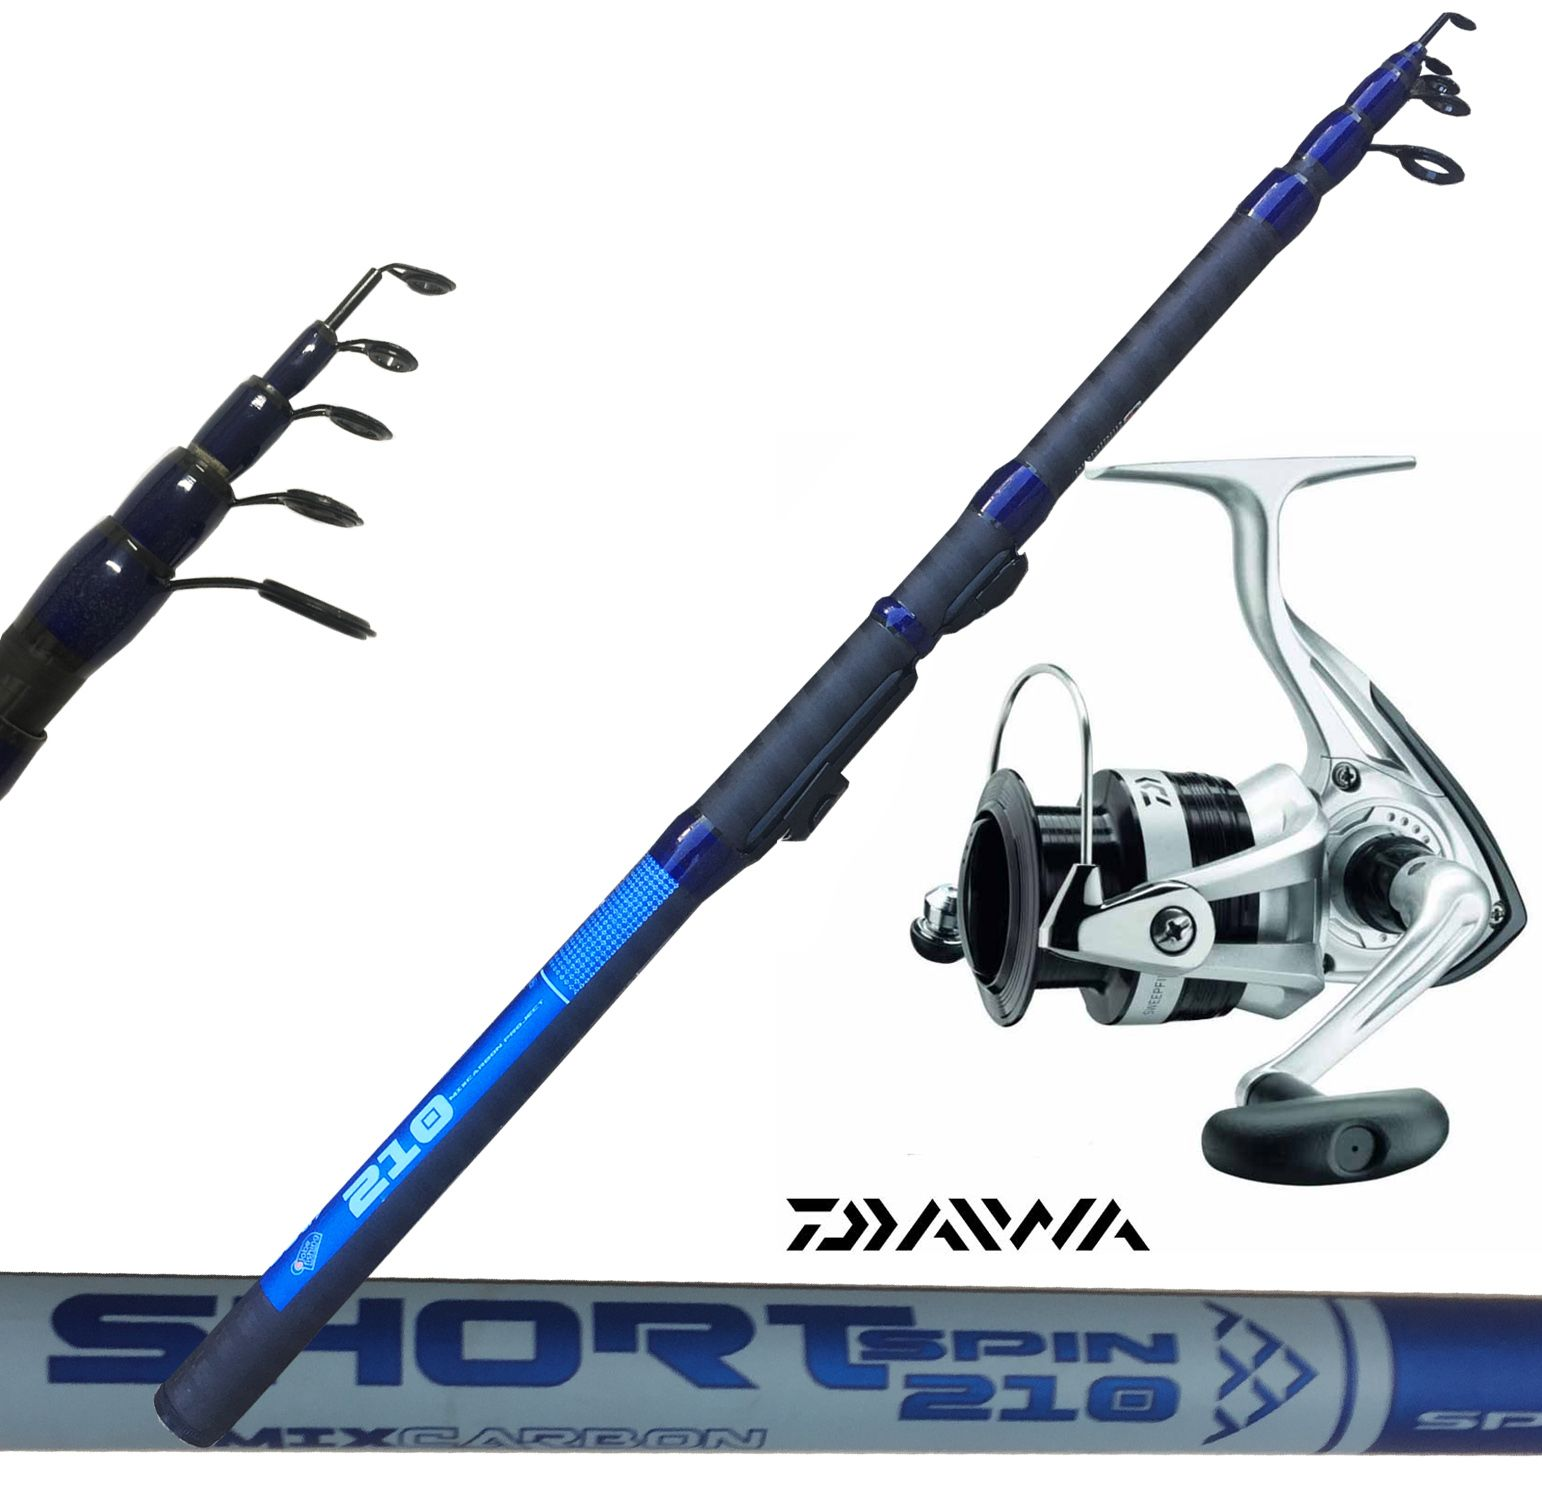 Kit Spinning Canna Shorty 210  Mulinello Daiwa Sweepfire 2000 - EUR 39.00